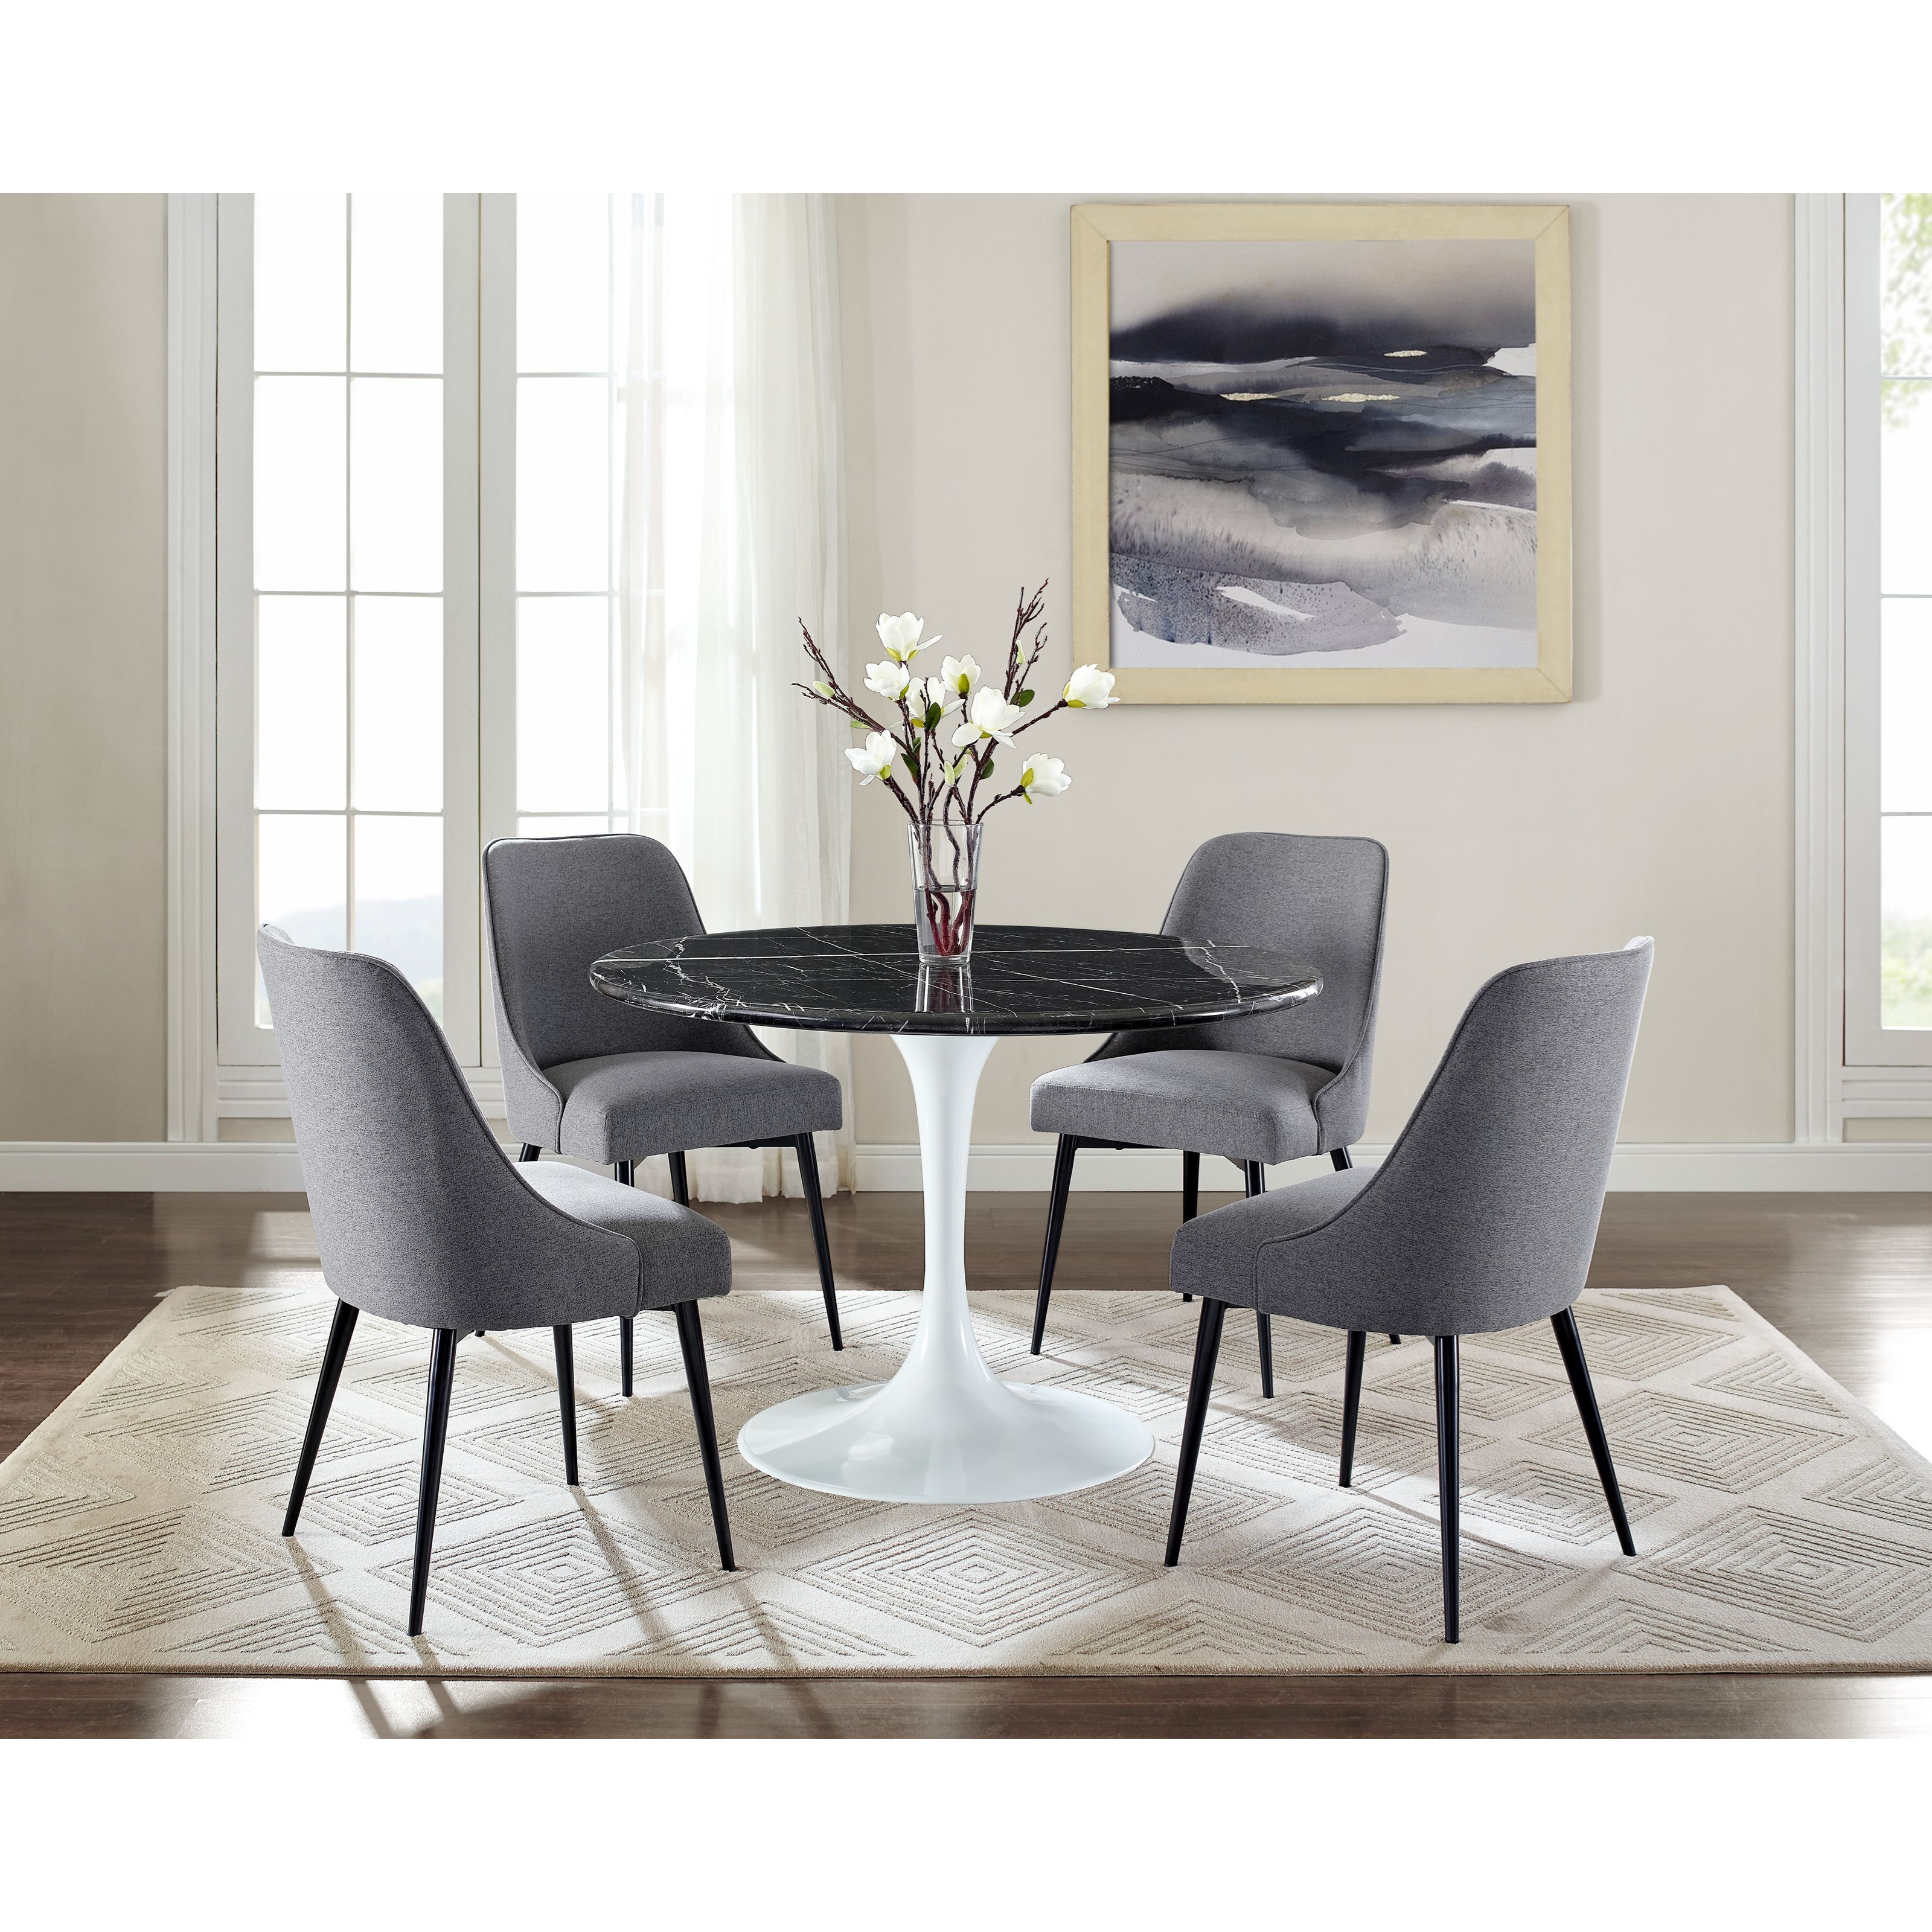 Dining Room Furniture Essentials: Belfort Essentials Colfax Mid Century Modern Upholstered